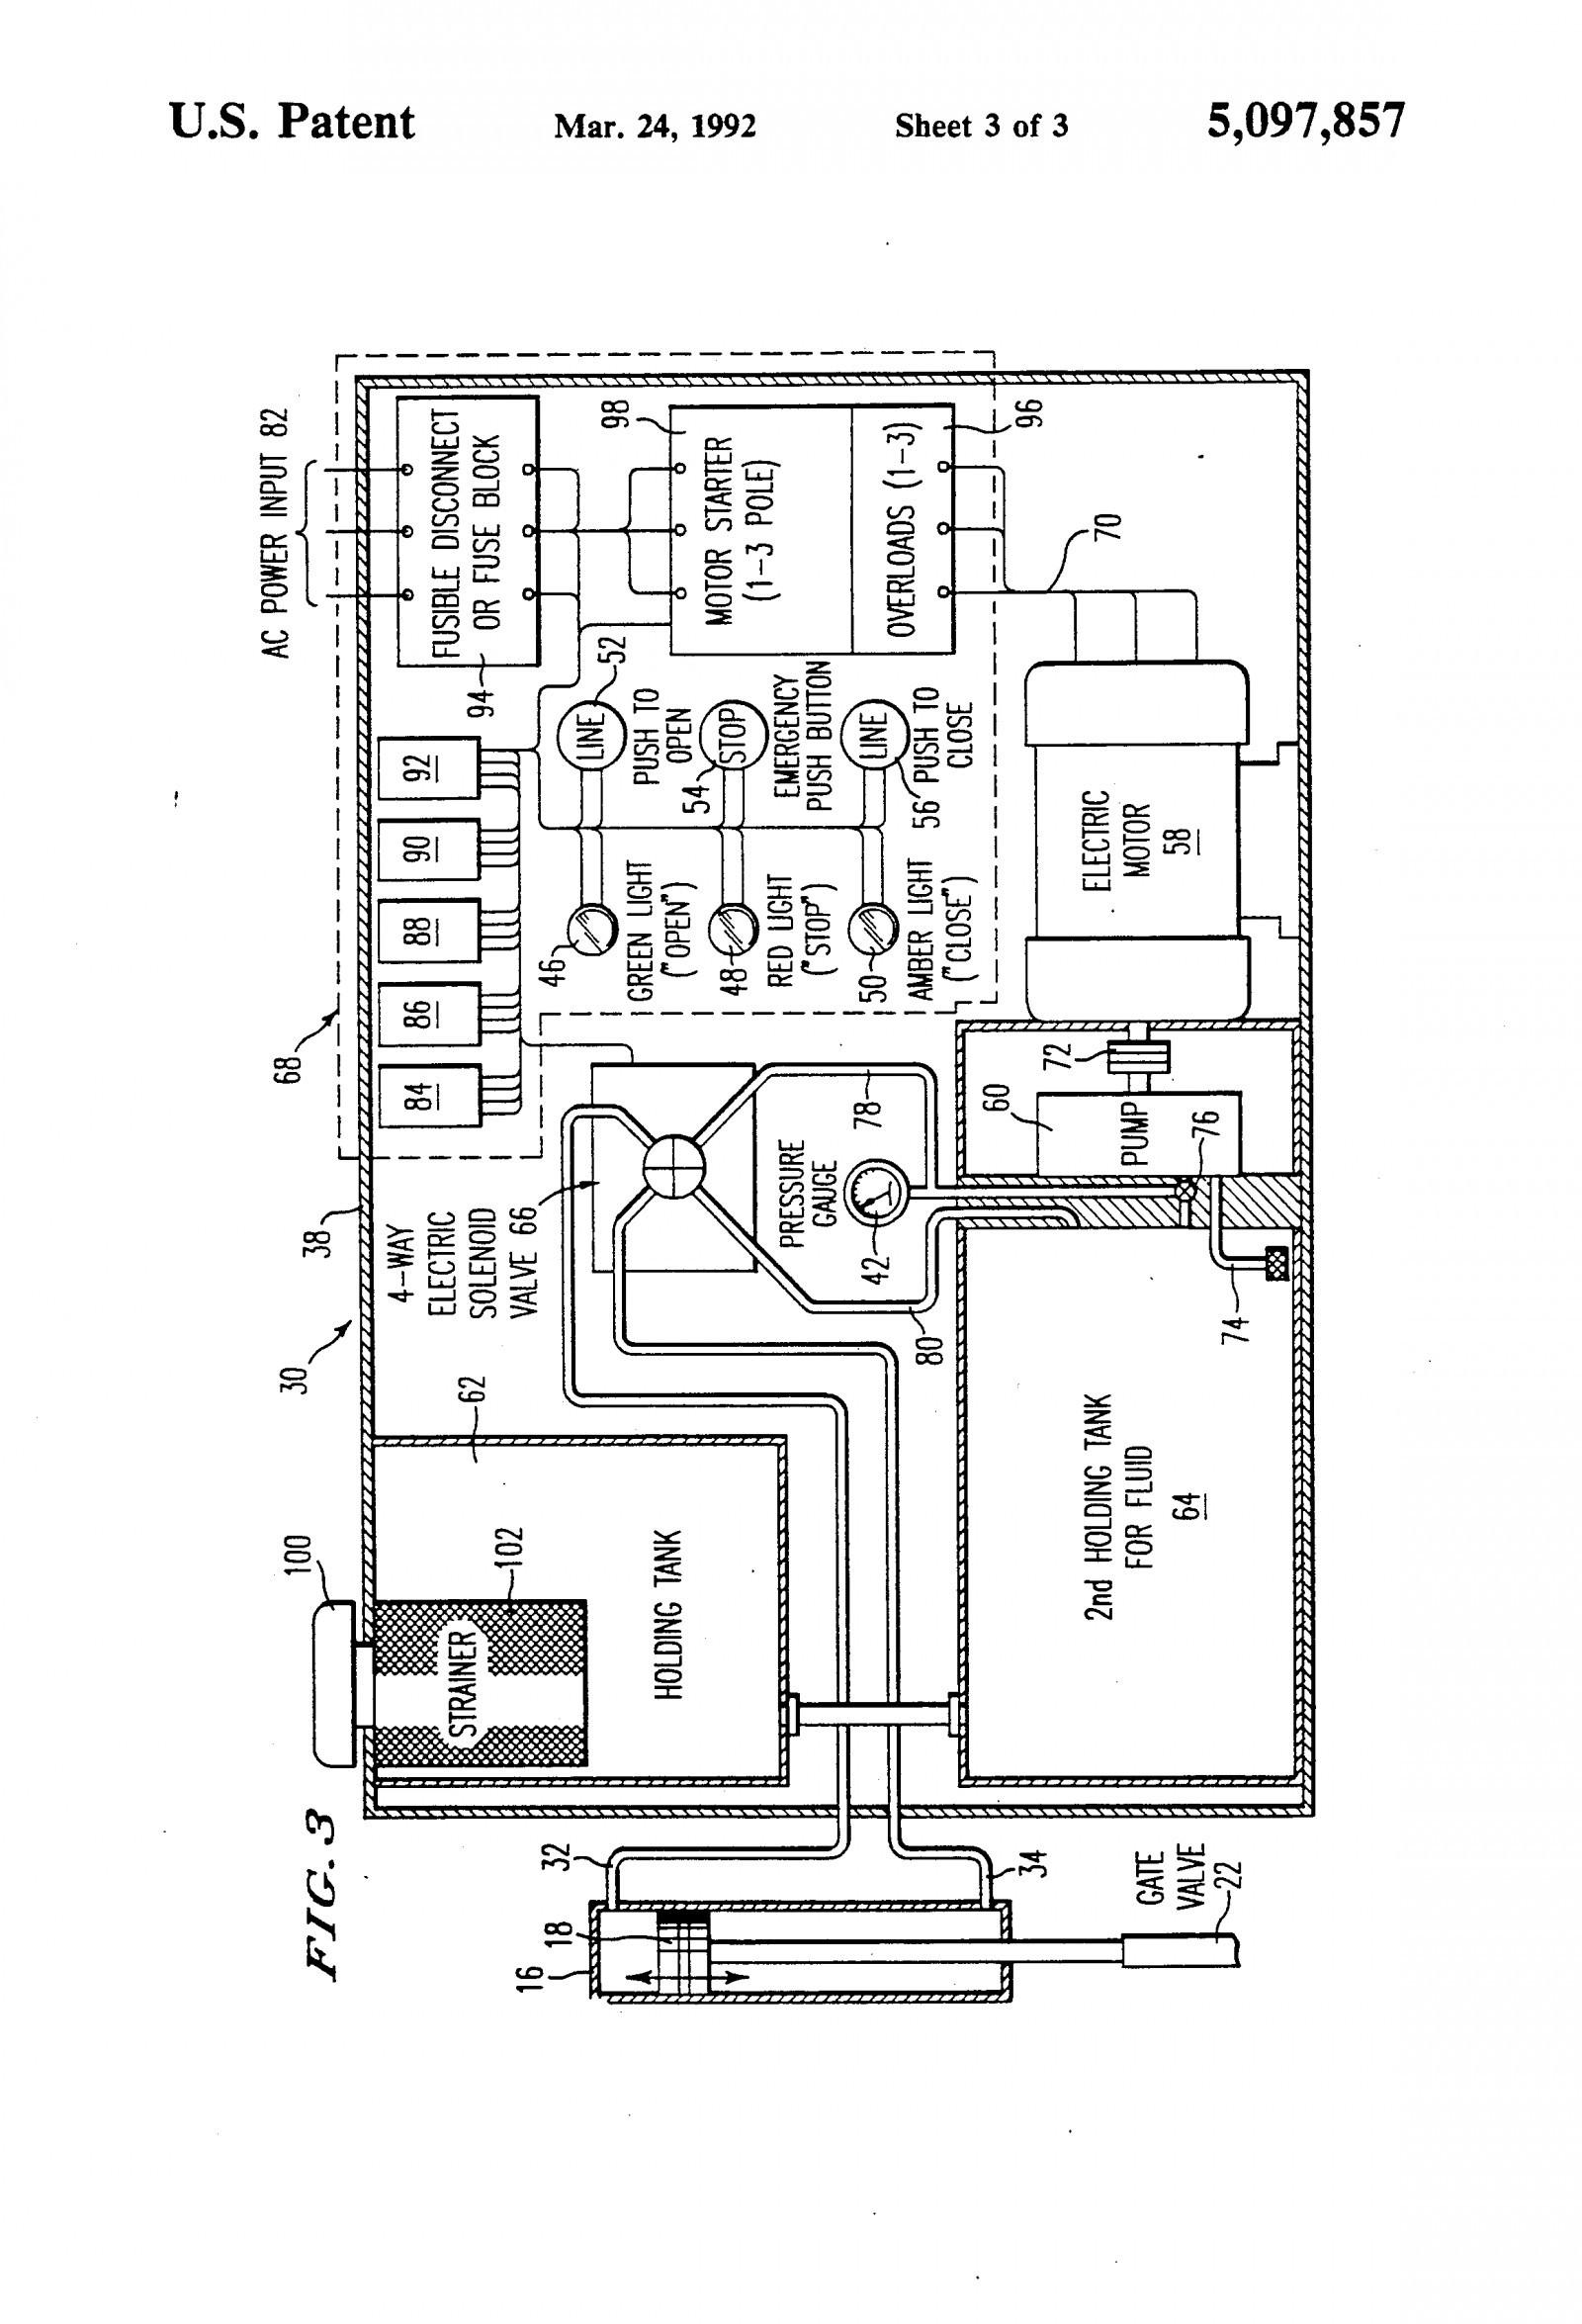 Linear Actuator Wiring Diagram Valid Wiring Diagram Rotork